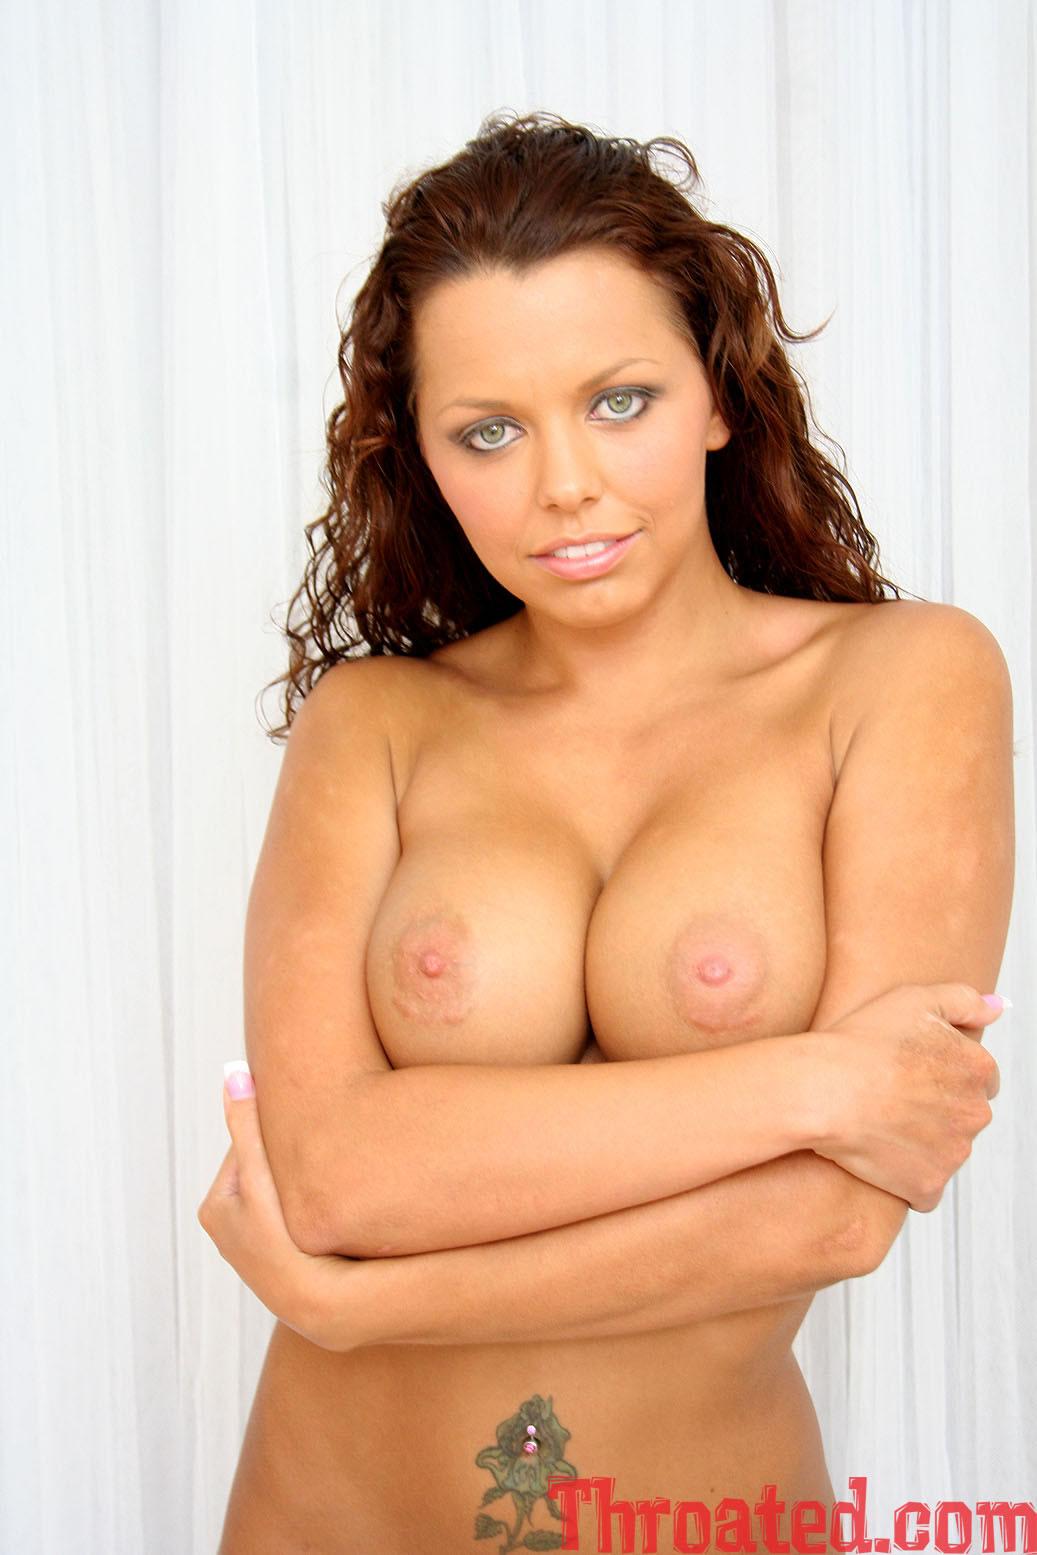 Famous pornstar galleries porno photo